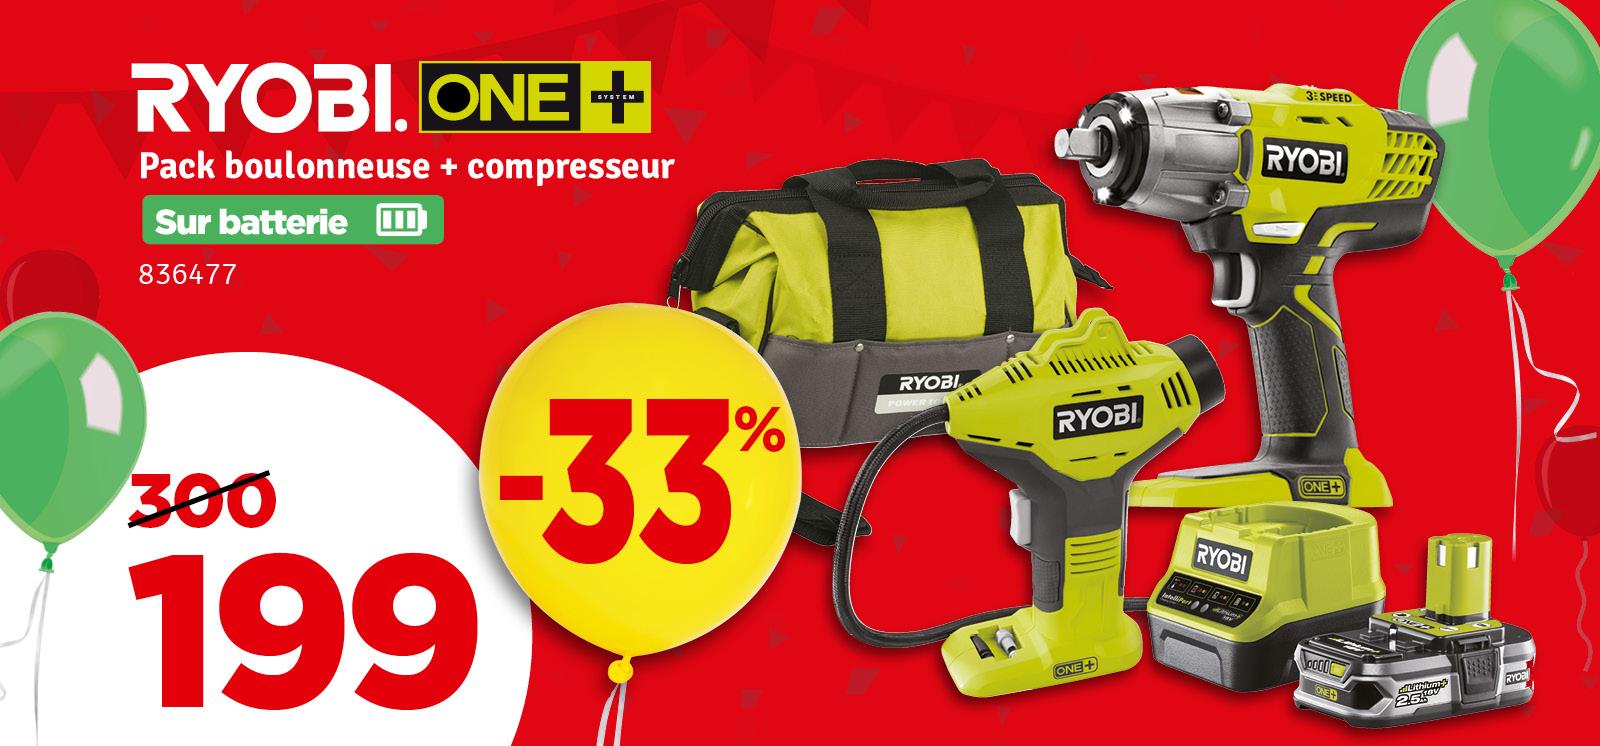 Promo - Pack boulonneuse + compresseur One+ Ryobi